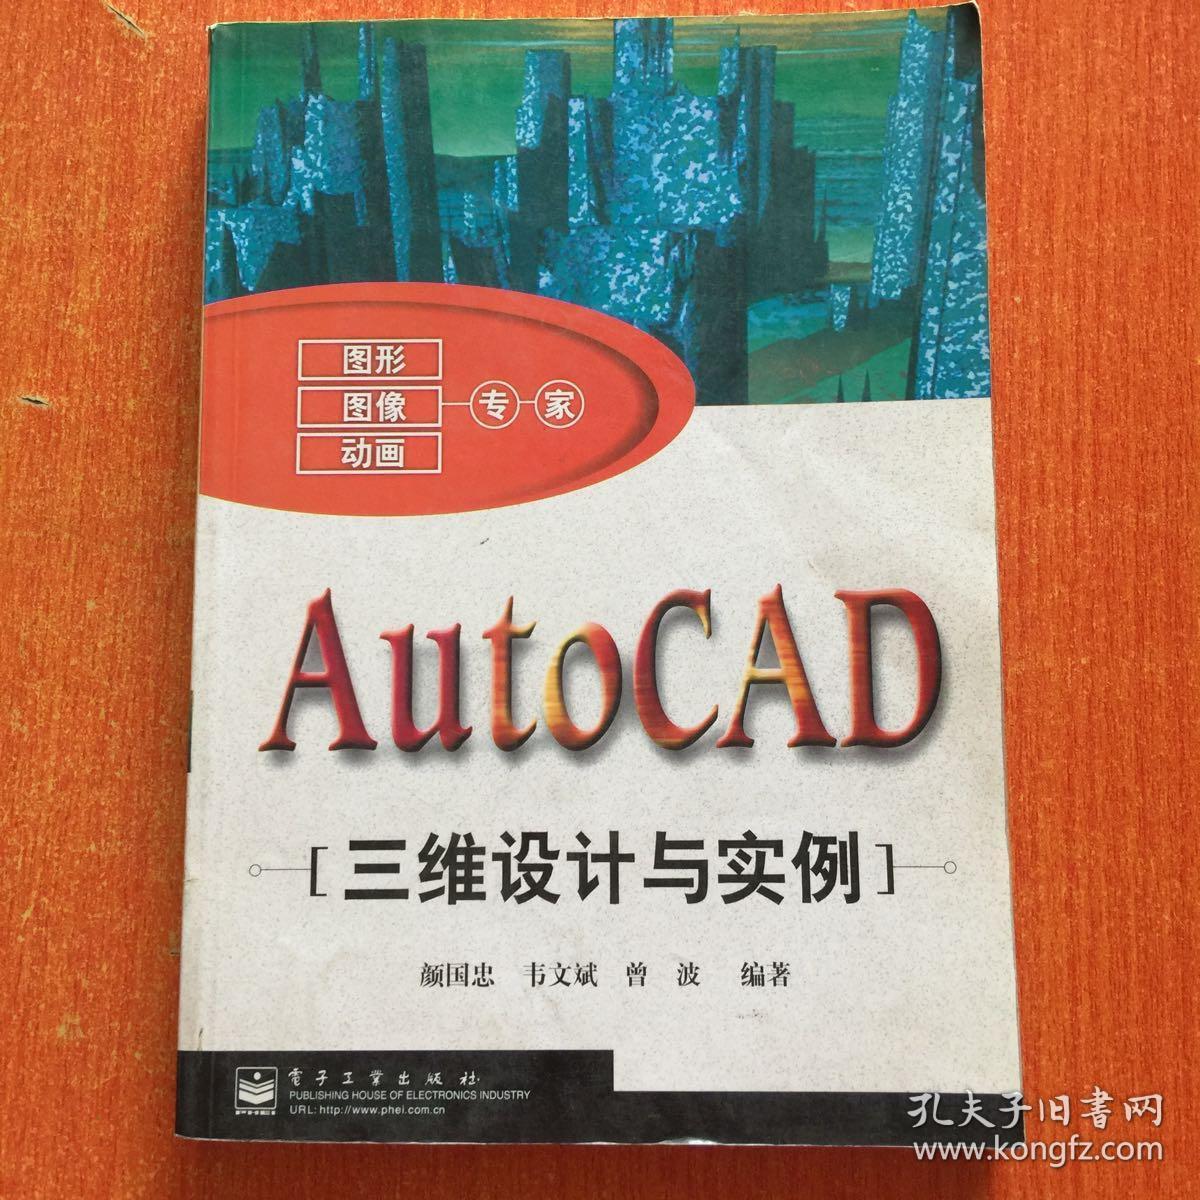 autocad三维设计与实例